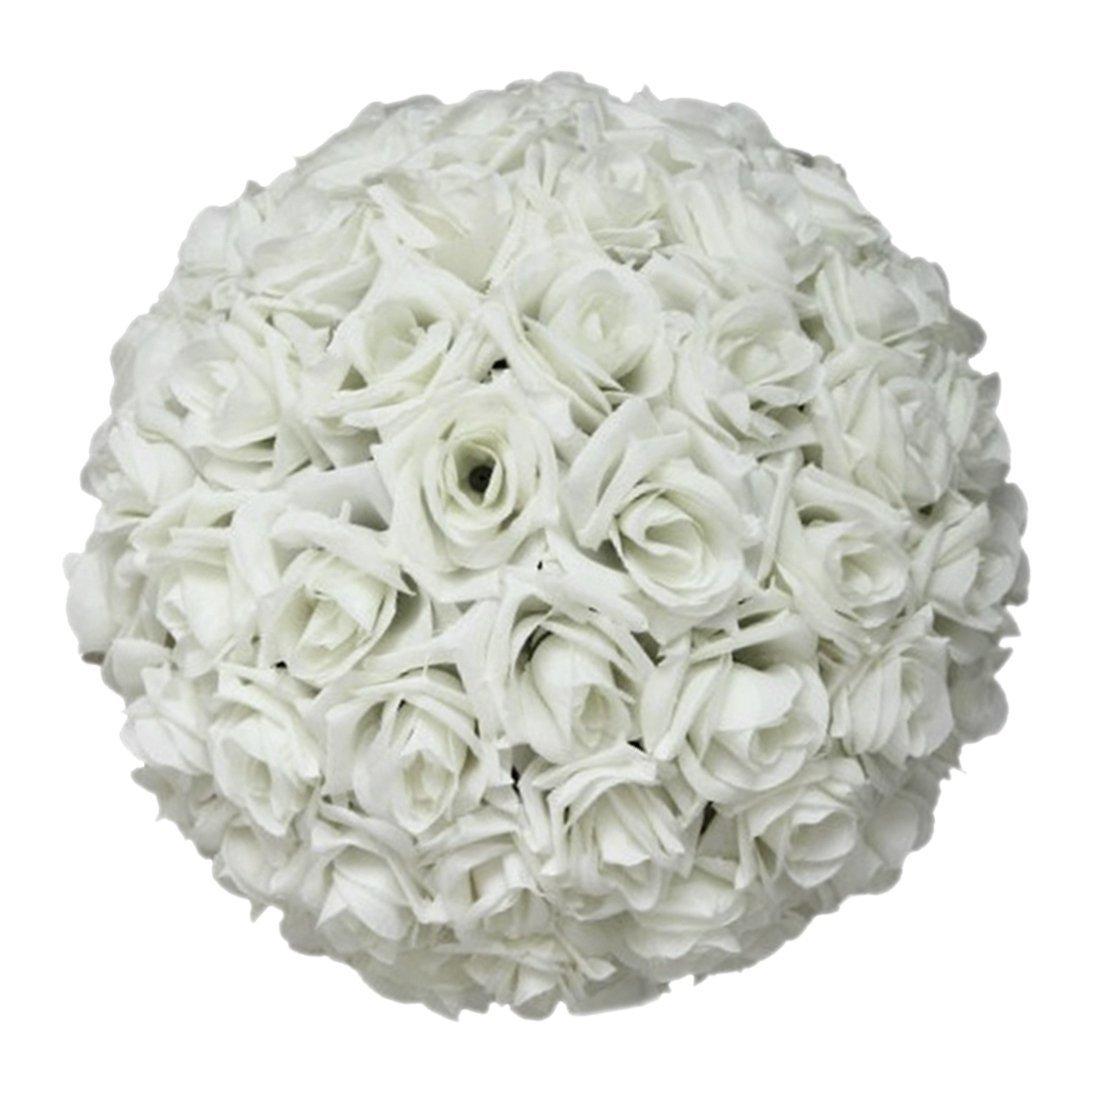 100 Mint Flowers Artificial Mint Rose Fake Flower For Wedding Decor Centerpieces